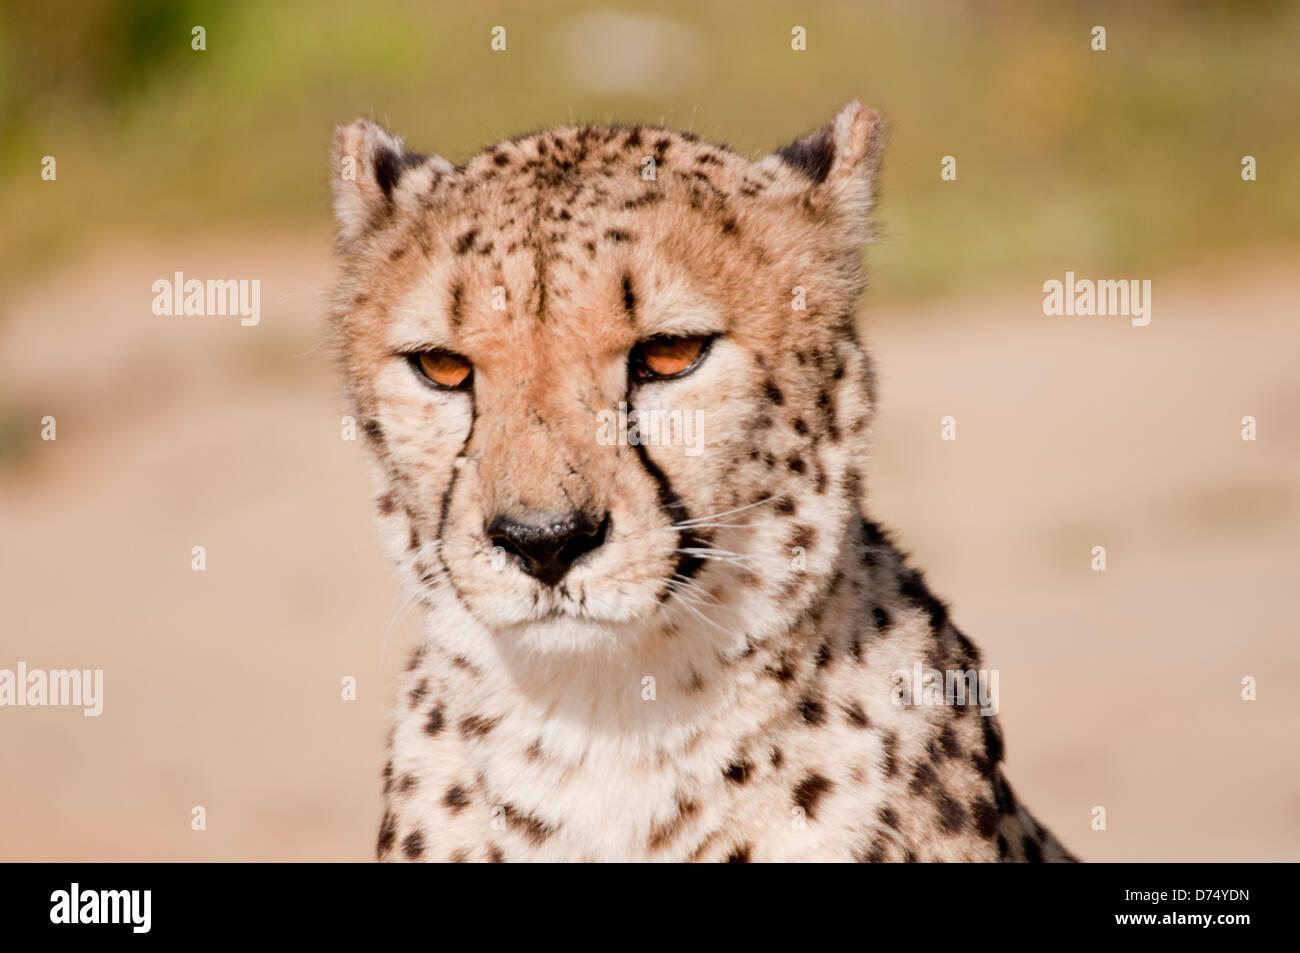 Cheetah sitting in the sun. - Stock Image